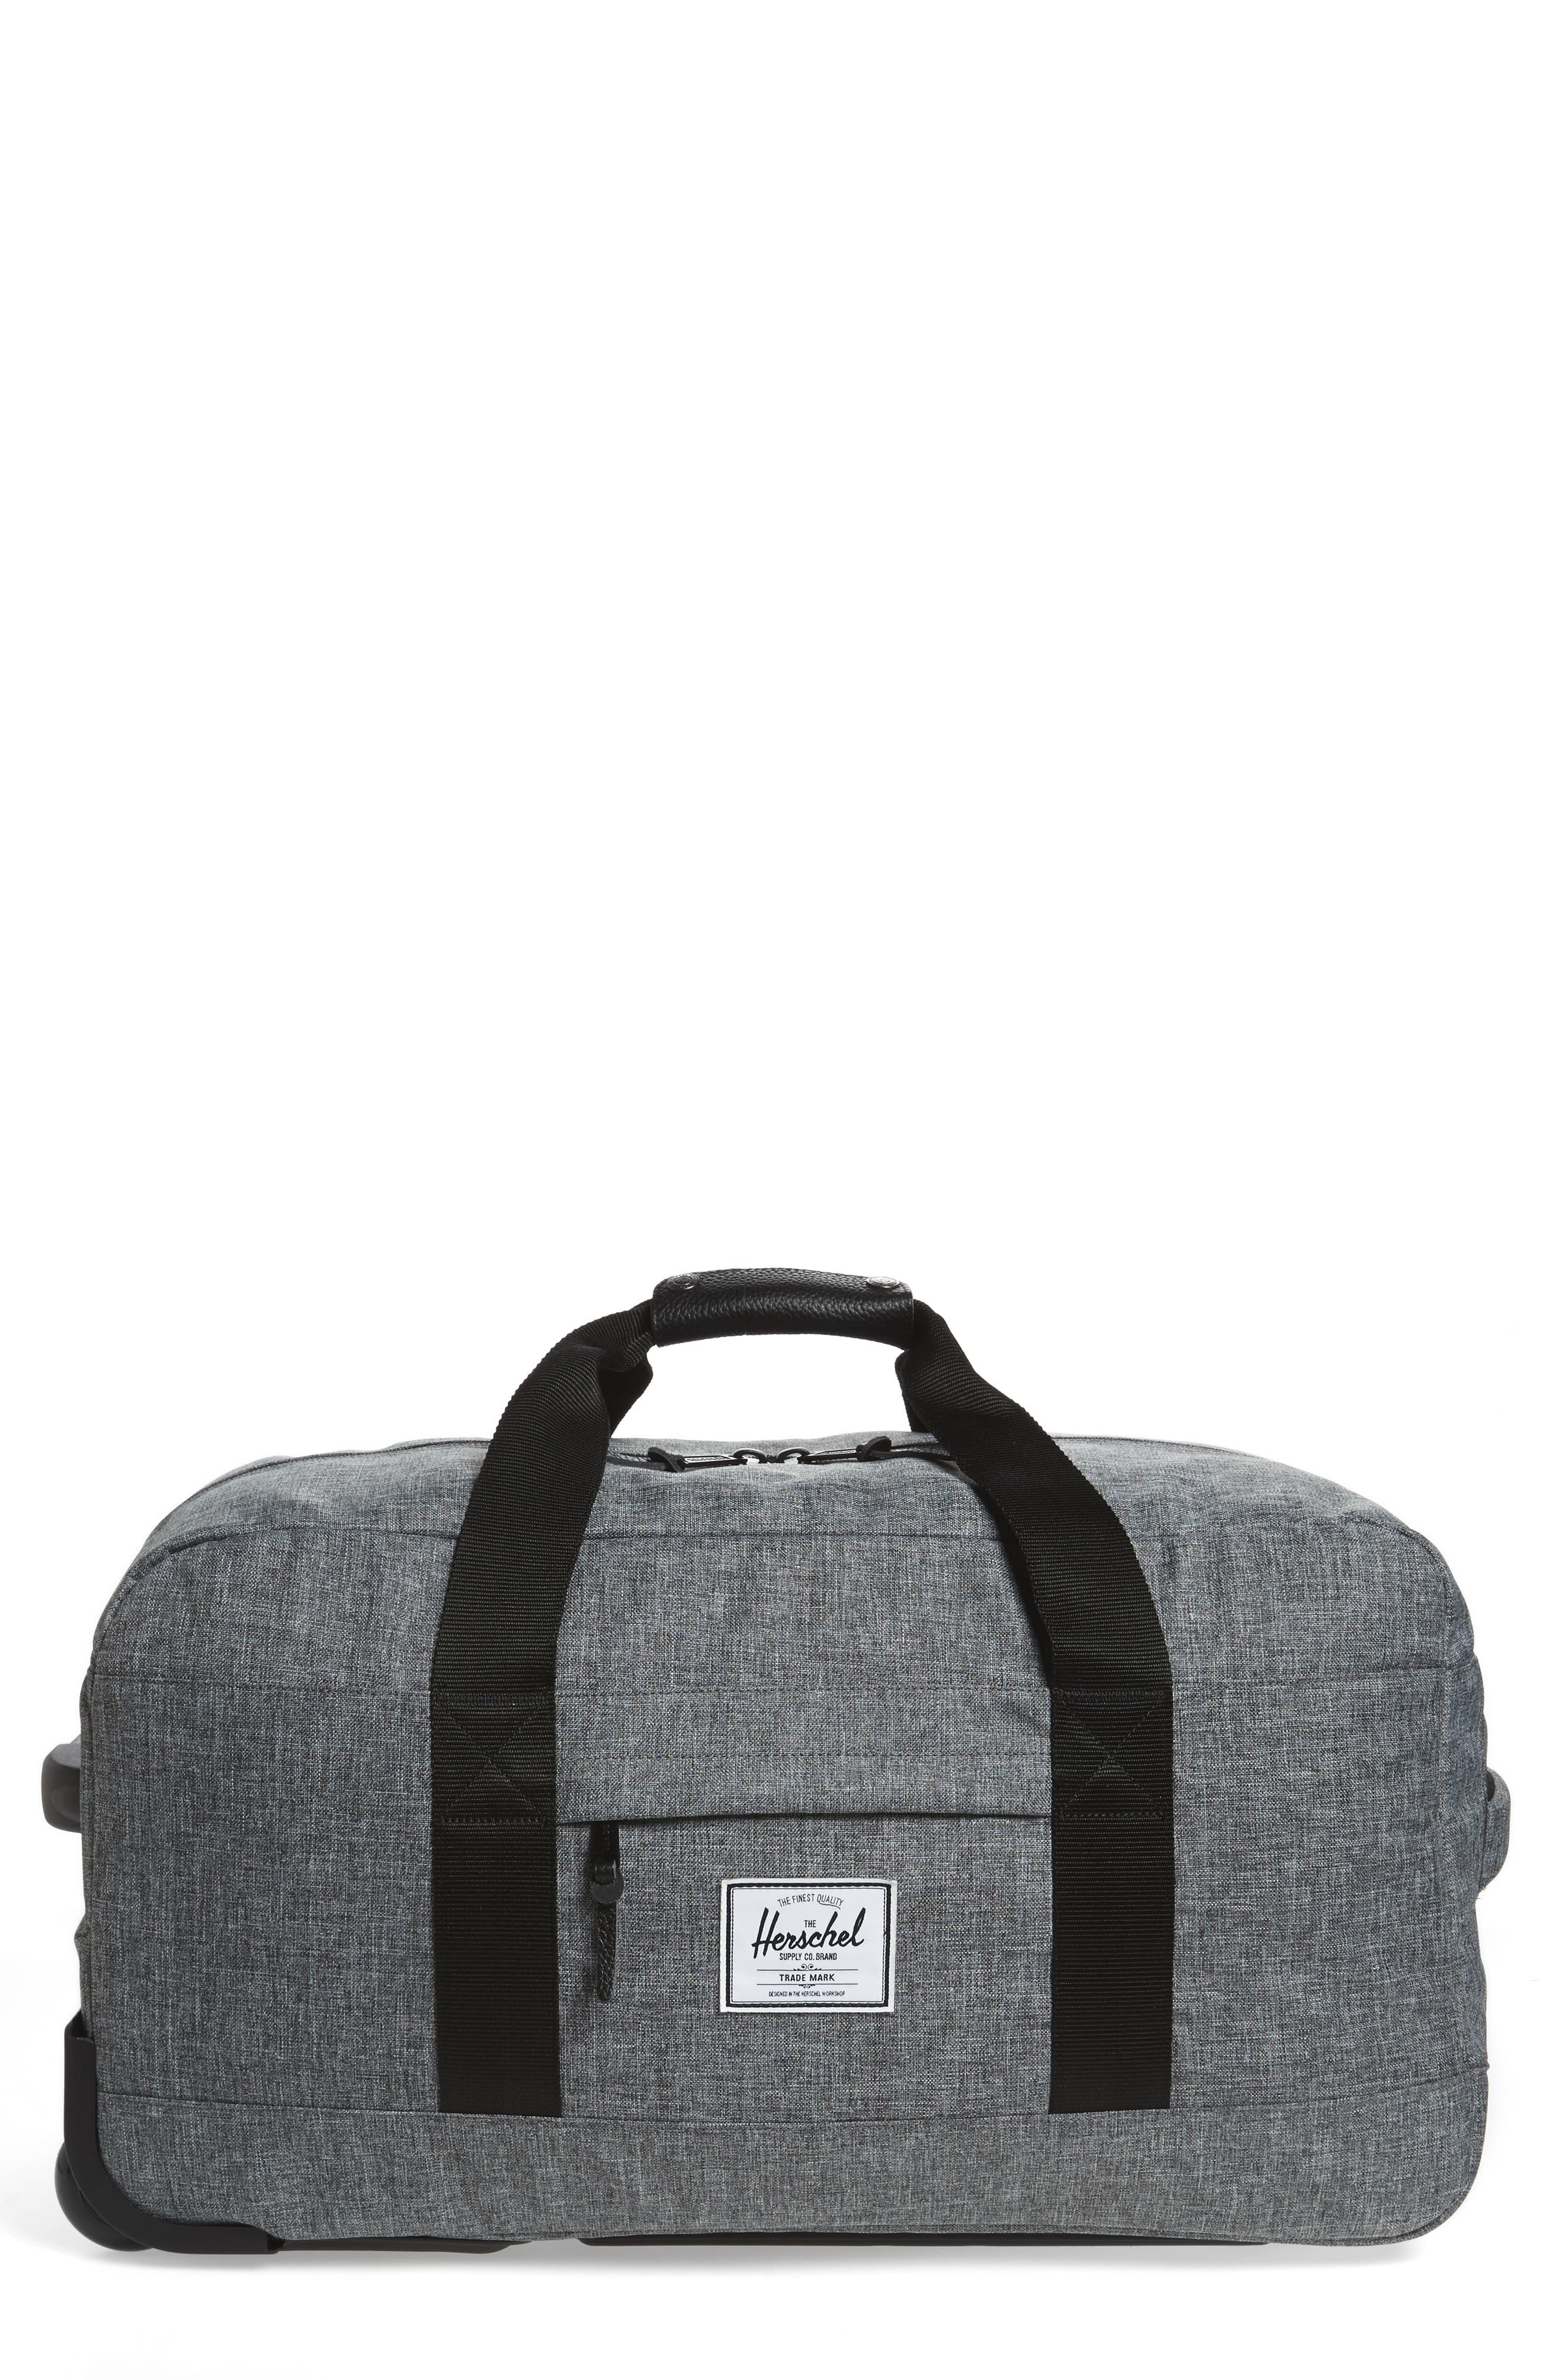 HERSCHEL SUPPLY CO., Wheelie Outfitter 24-Inch Duffel Bag, Main thumbnail 1, color, 084